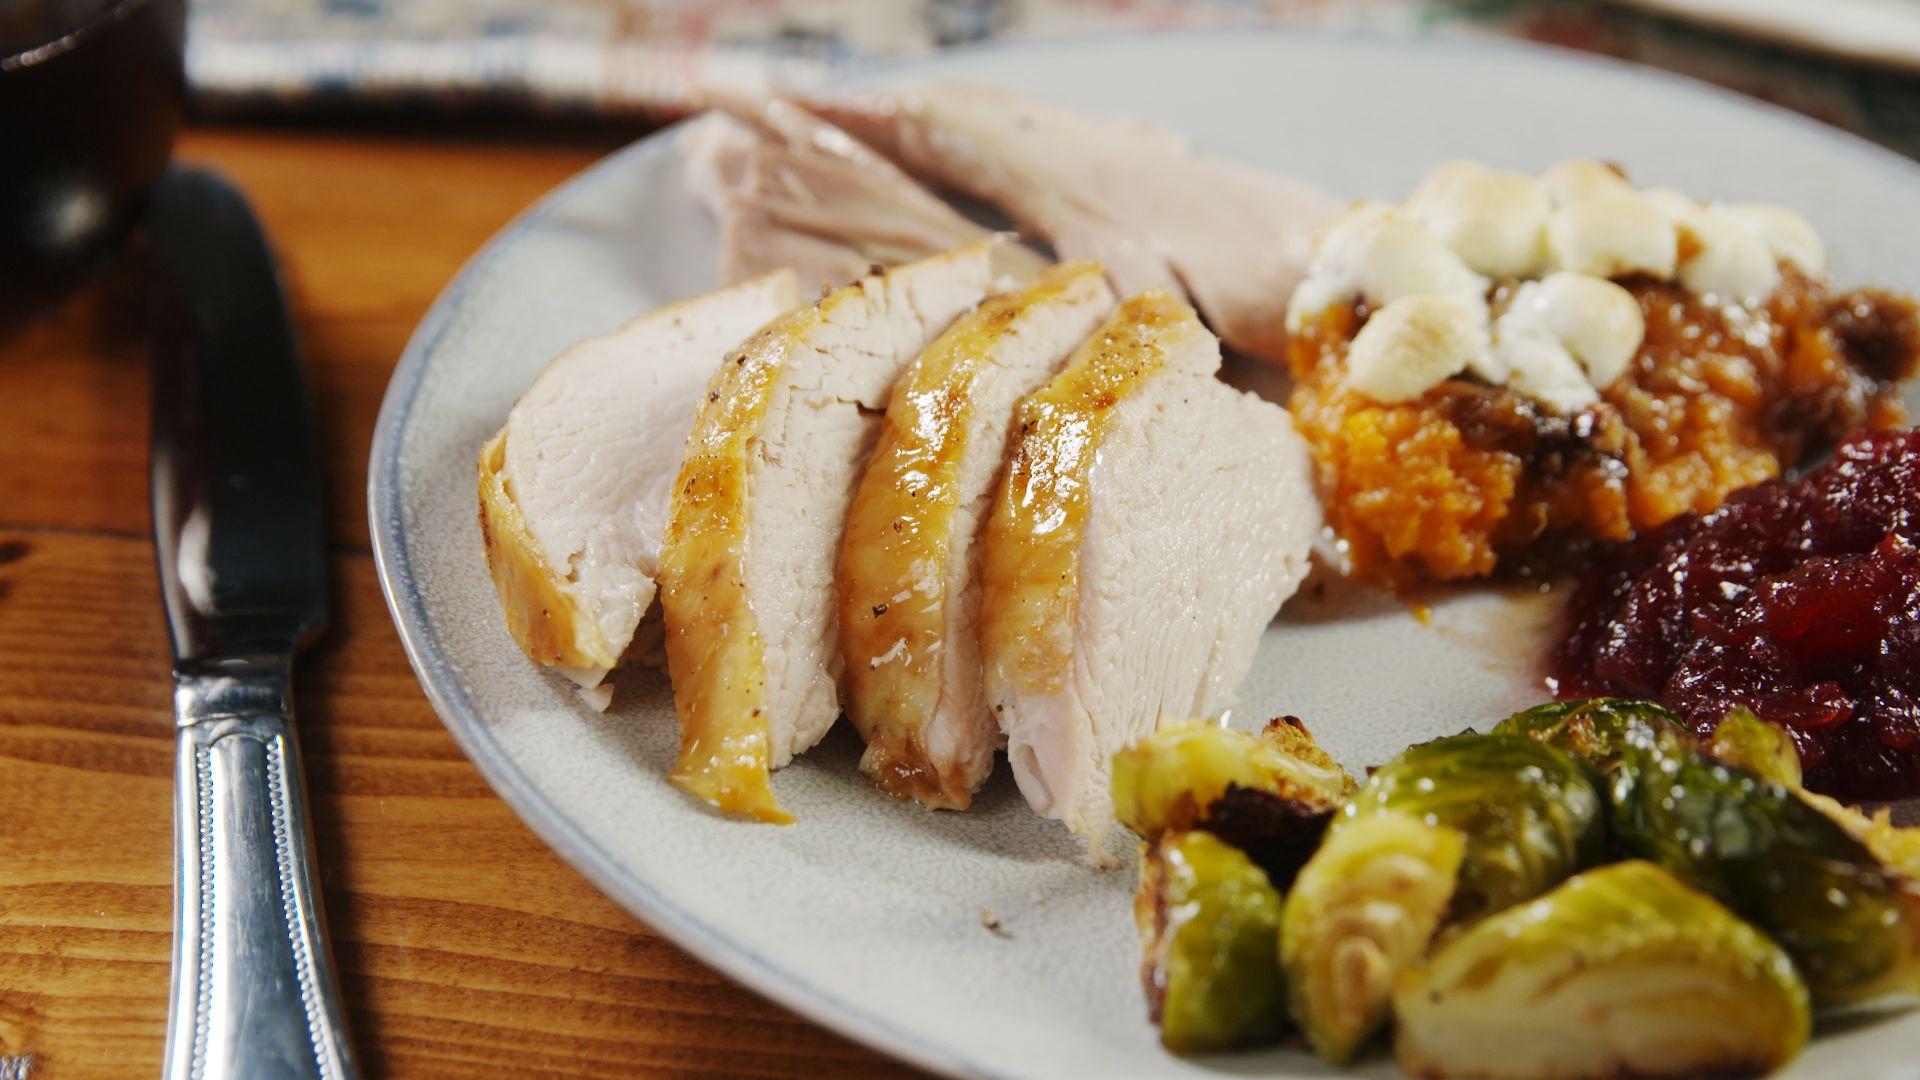 30 traditional thanksgiving dinner menu ideas and recipes delishcom - Southern Christmas Dinner Menu Ideas